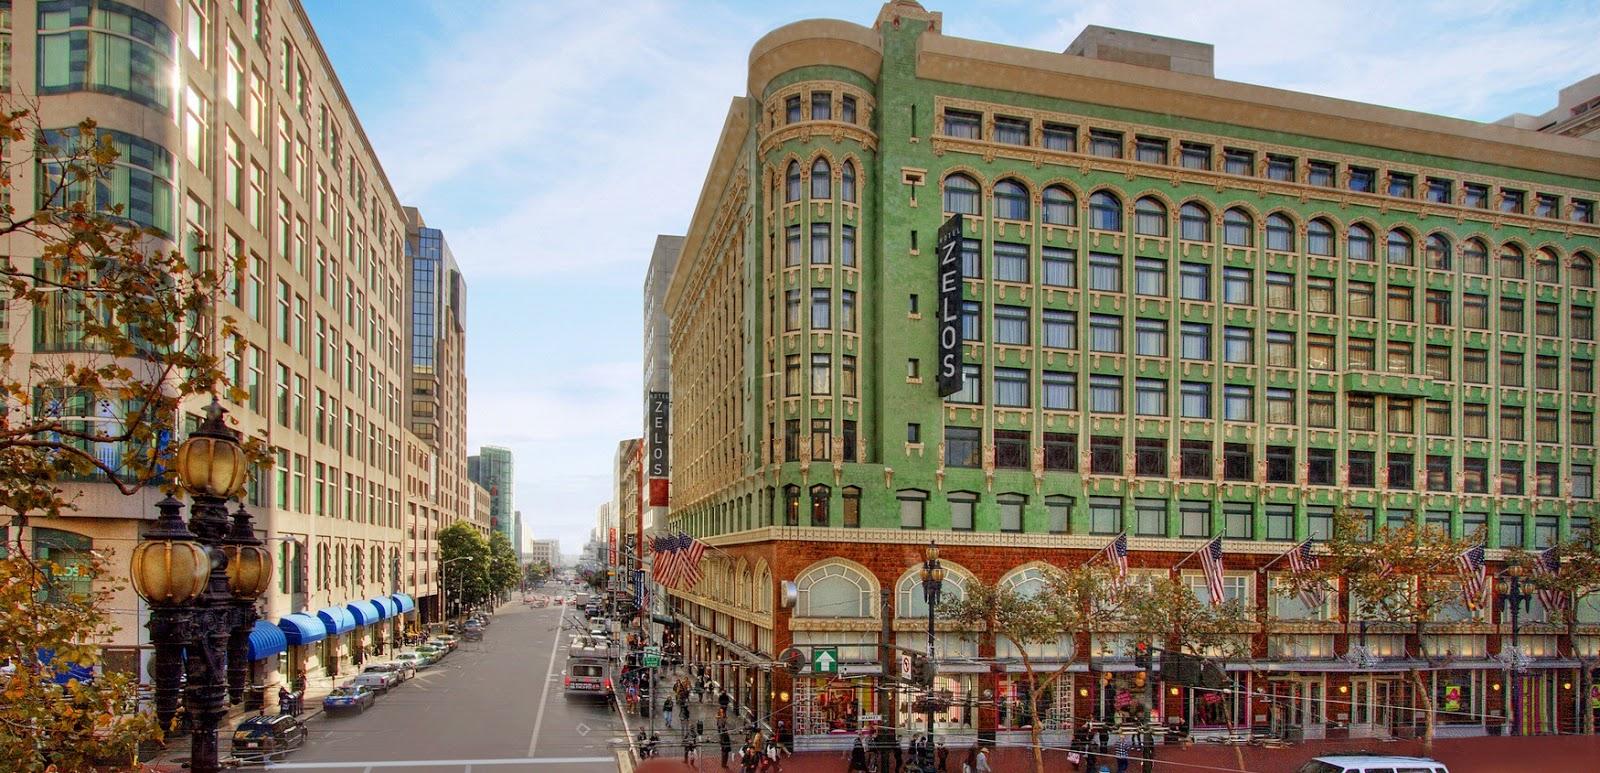 Hotel Zelos San Francisco Travelhoteltours Vacation Packages Flight And Hotel Bundle Save